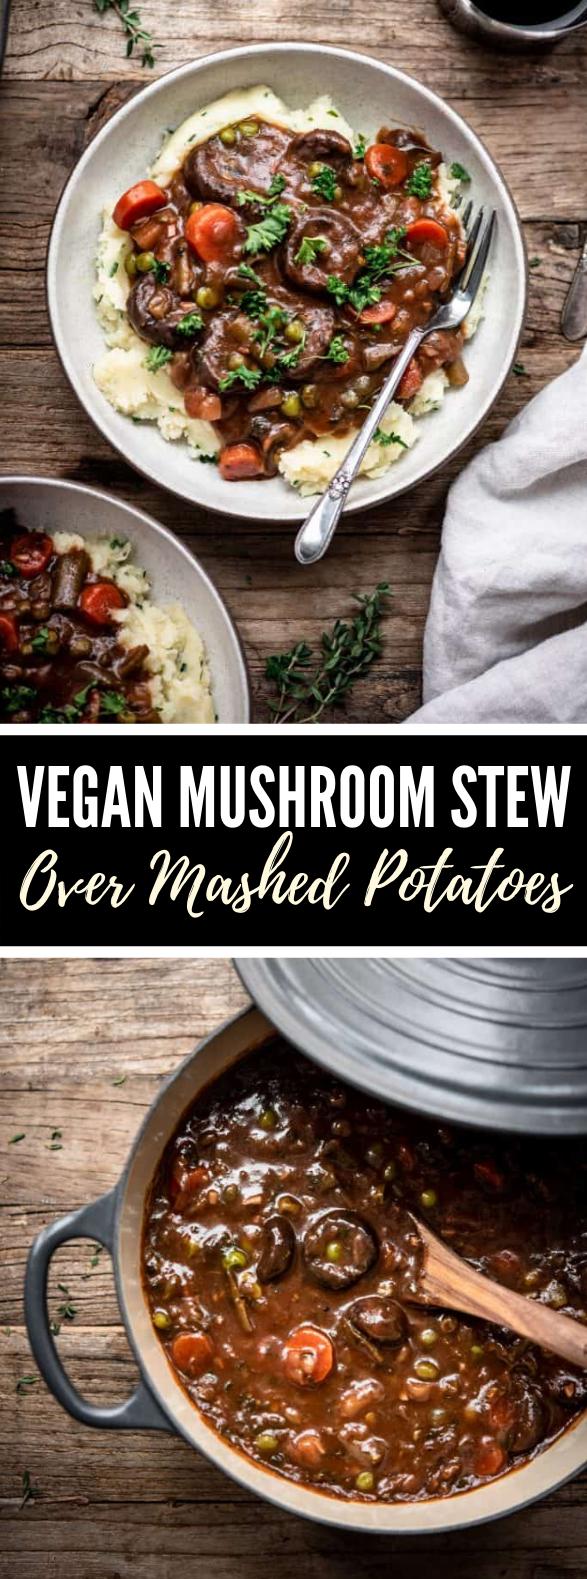 vegan mushroom stew over mashed potatoes #vegetarian #comfortfood